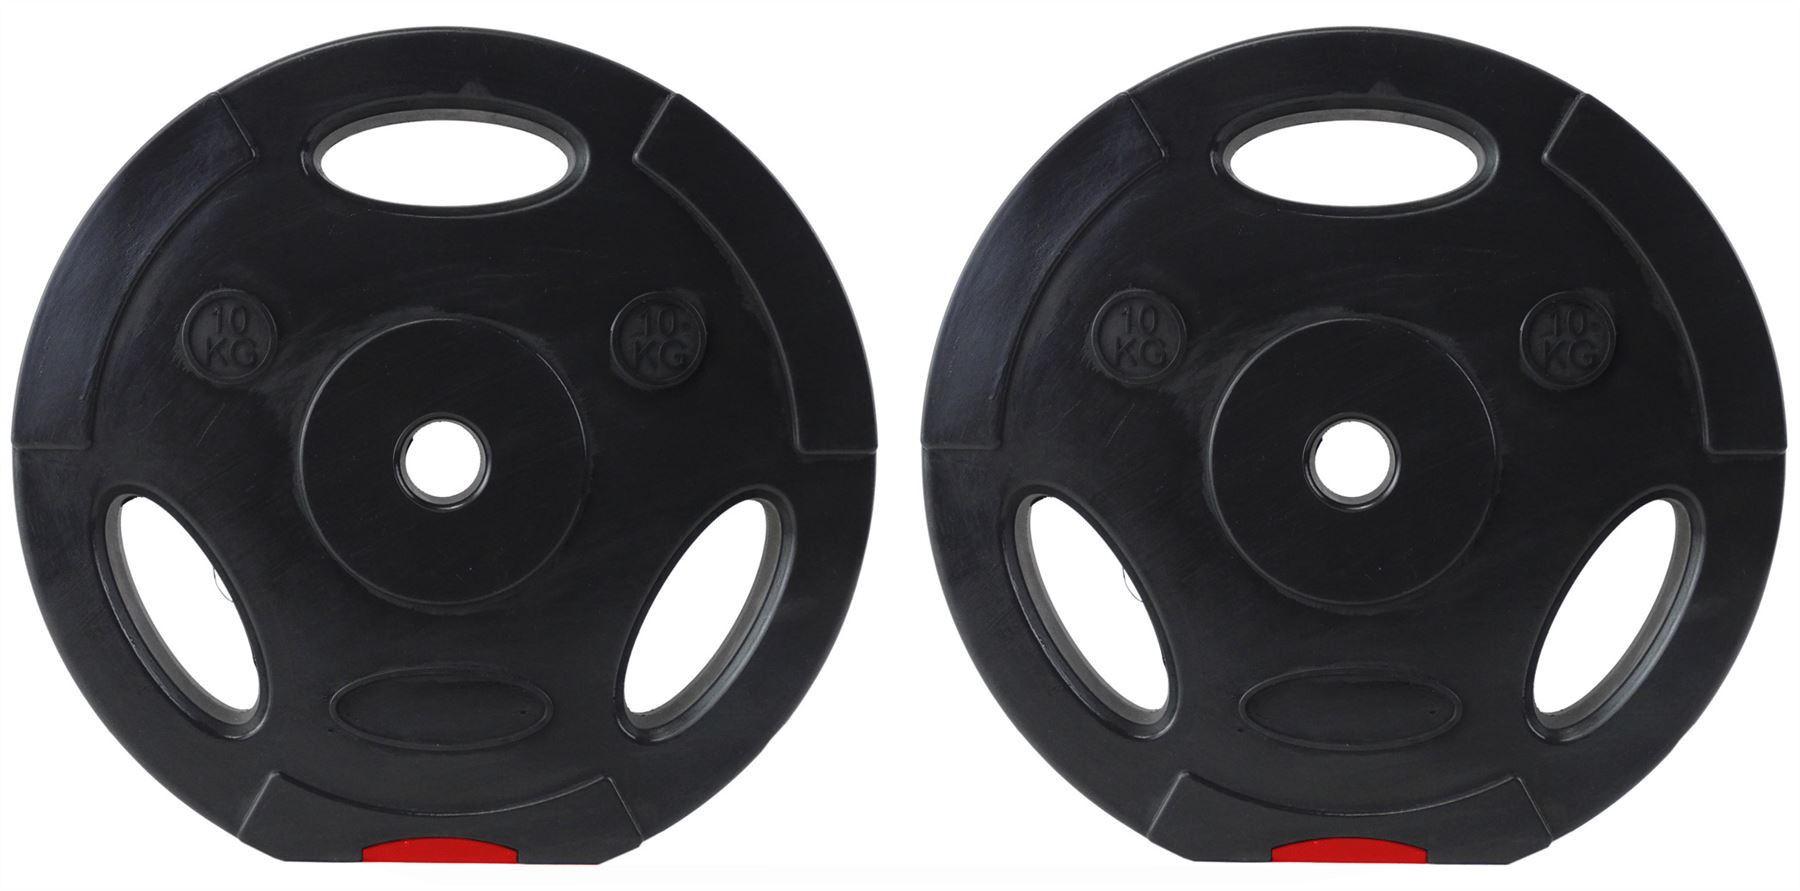 Bodyrip 1 Quot Standard 1 25 15kg Vinyl Tri Grip Cement